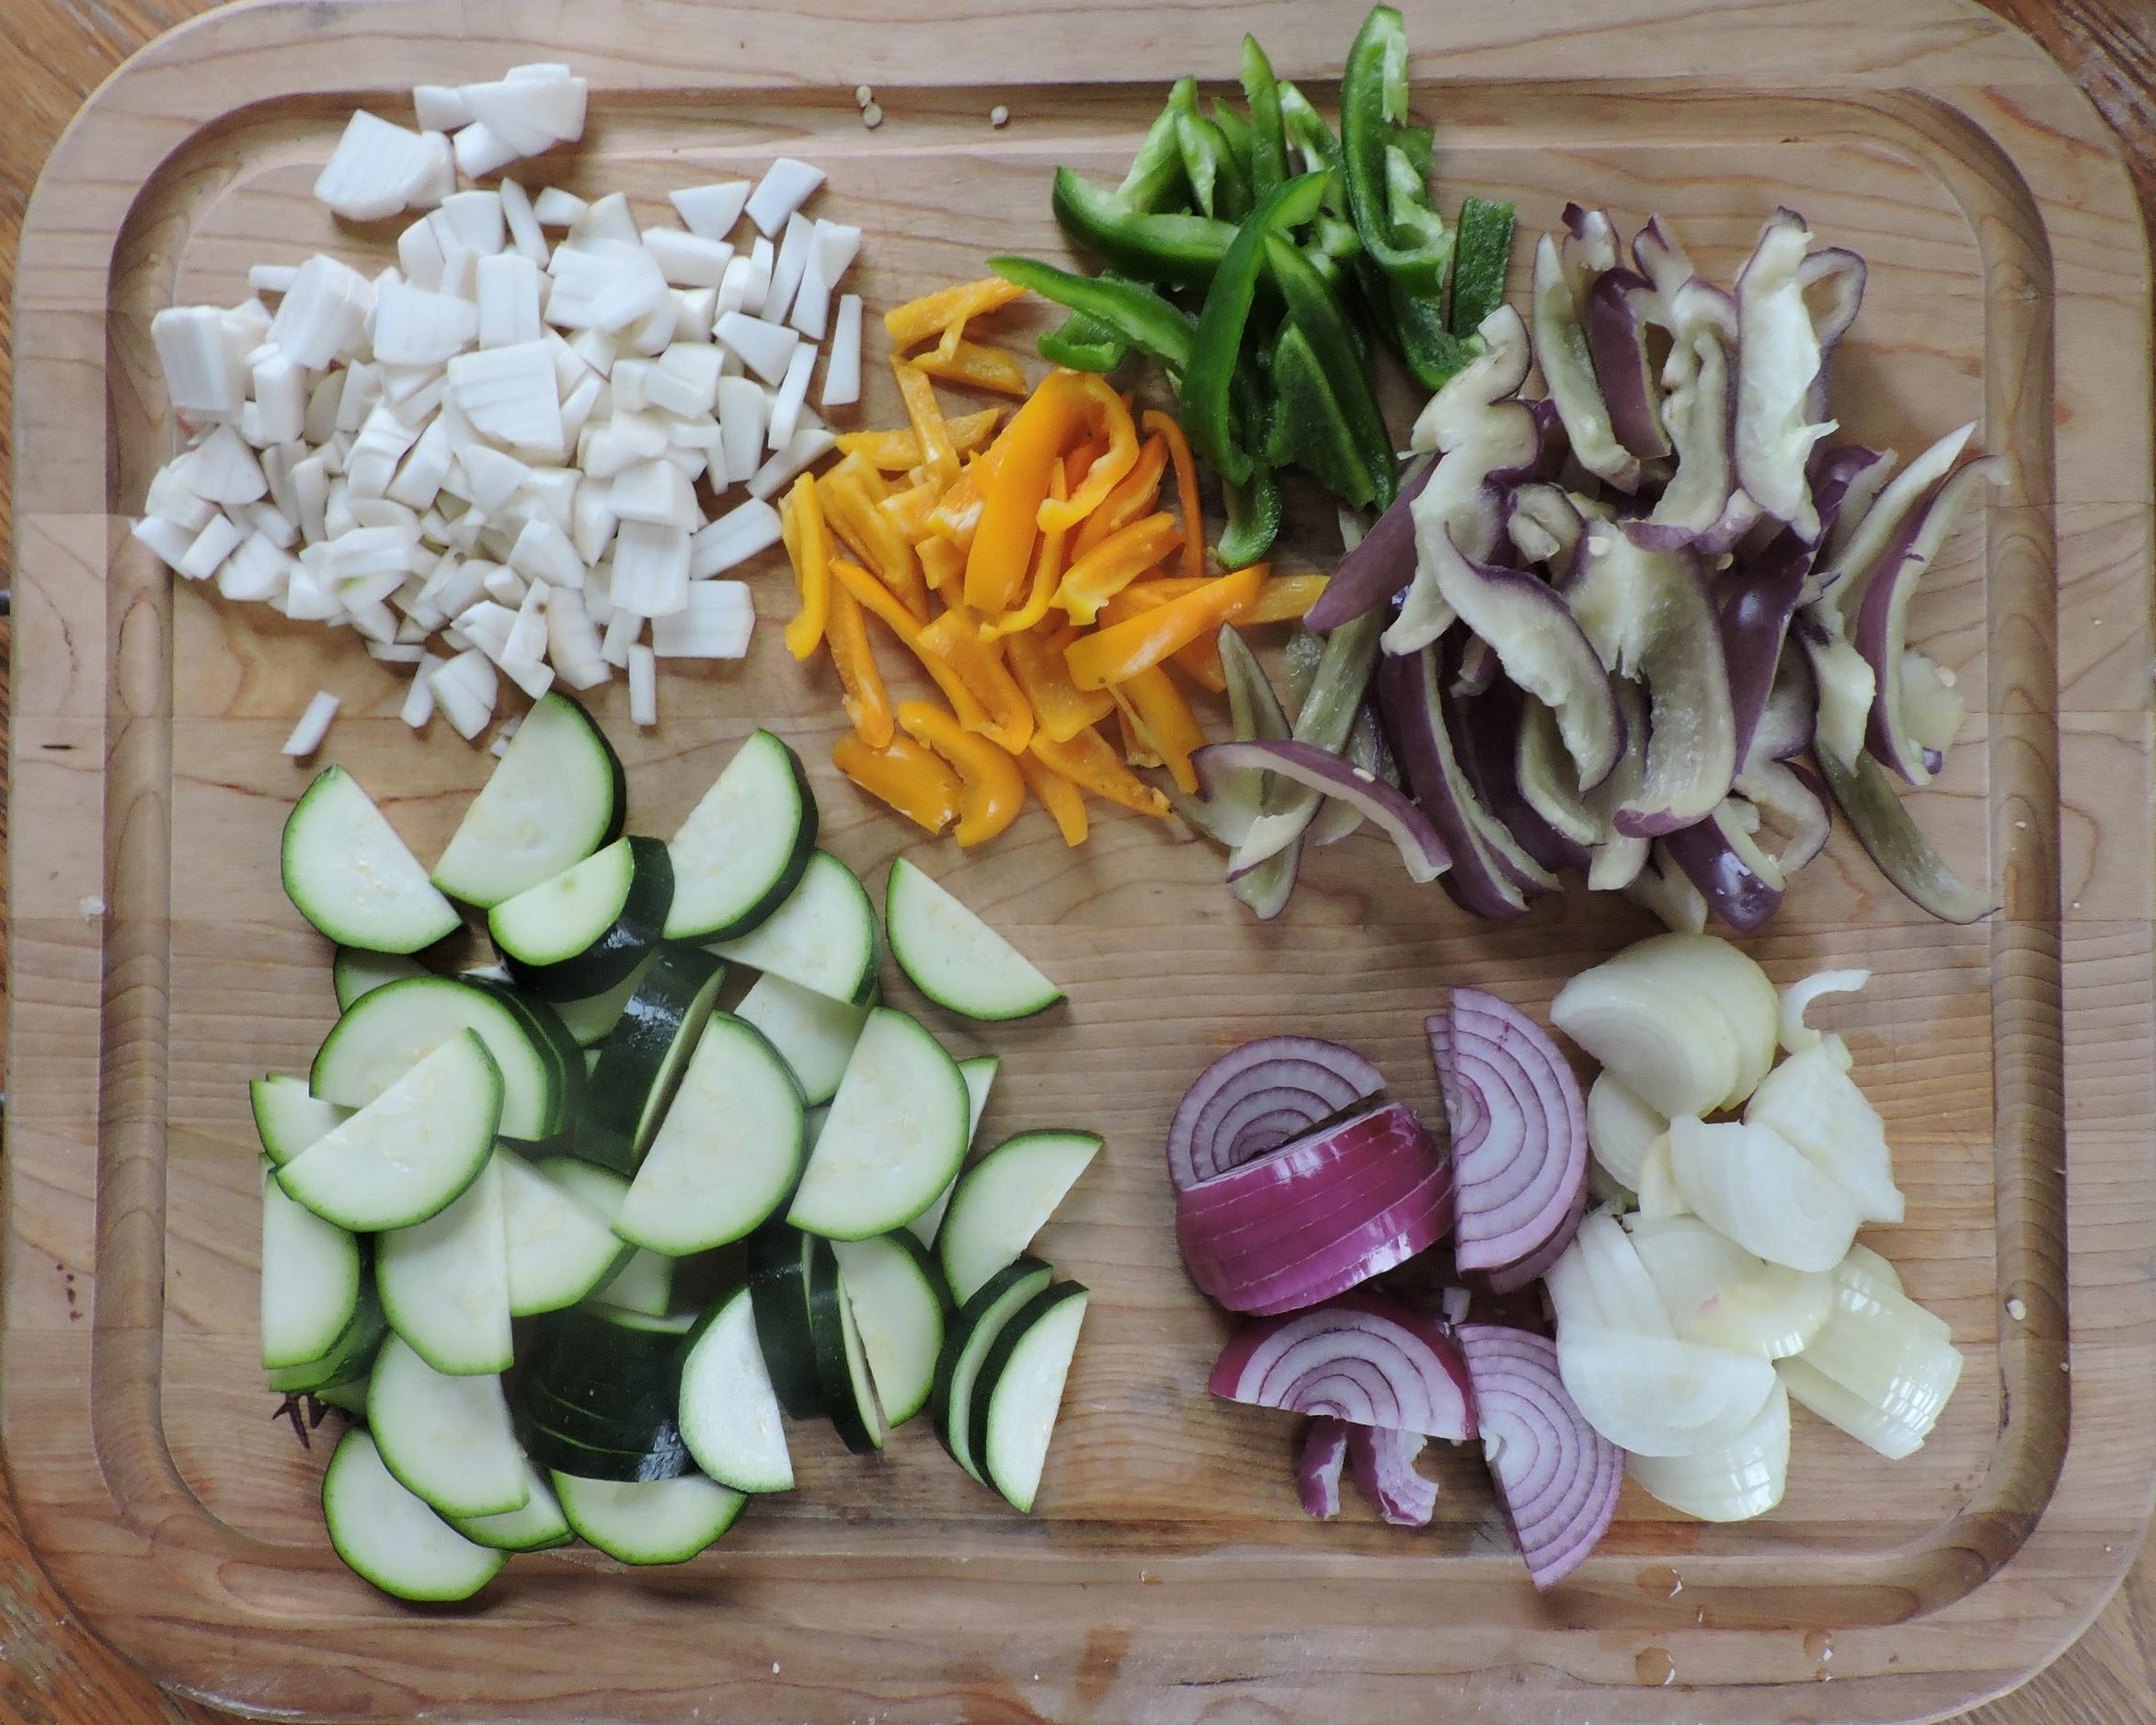 TOP: Turnips, orange, green, & purple peppers. BOTTOM: Zucchini, red & yellow onions.